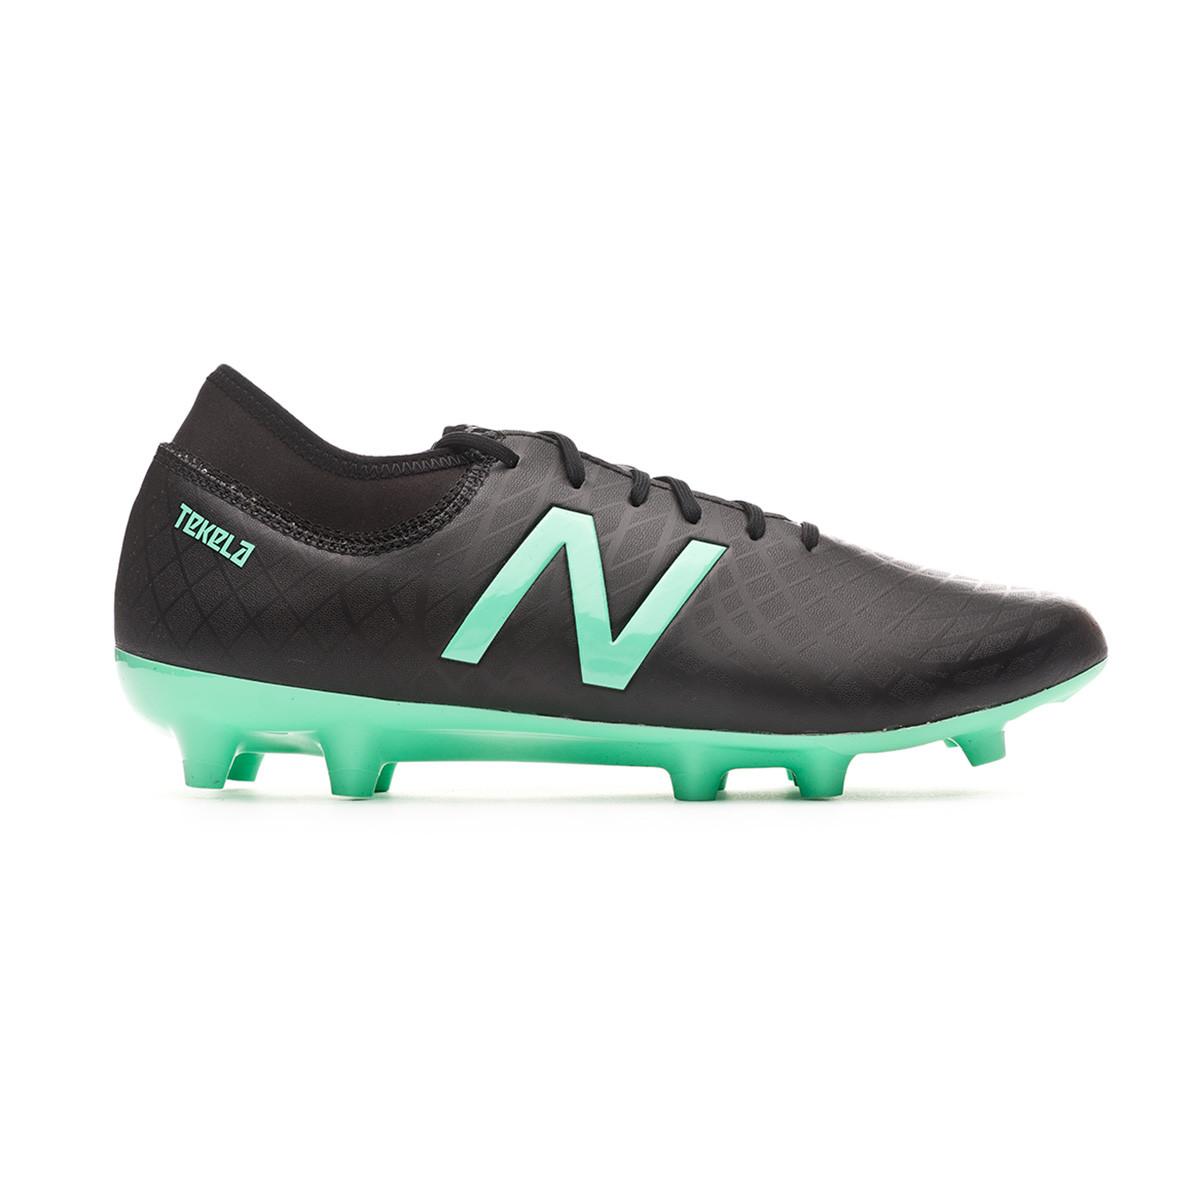 4b8f2dbc6 Football Boots New Balance Tekela Magique FG-Hybrid Black-Neon emerald -  Football store Fútbol Emotion